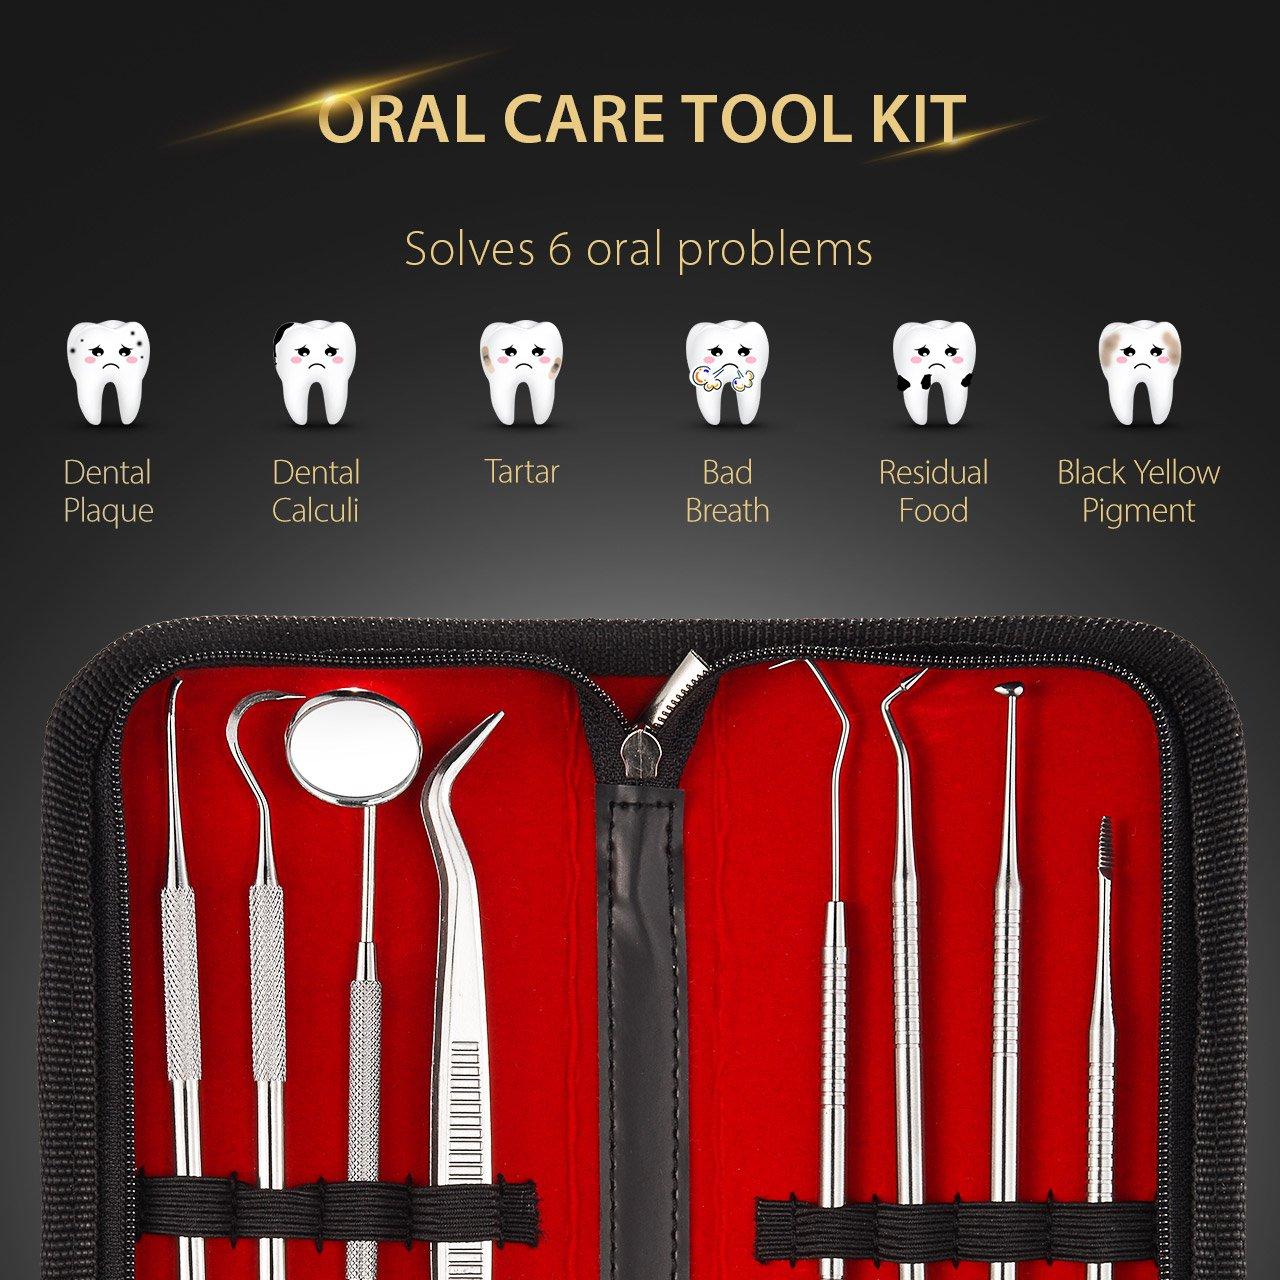 Dental Tools, ElleSye 8 PACK Dental Pick Oral Care Kit, Stainless Steel Dental Hygiene Kit Set, Tooth Scraper Plaque Tartar Dental Scaler Tweezers Mouth Mirror for Personal & Pet Oral Care Use by ELLESYE (Image #2)